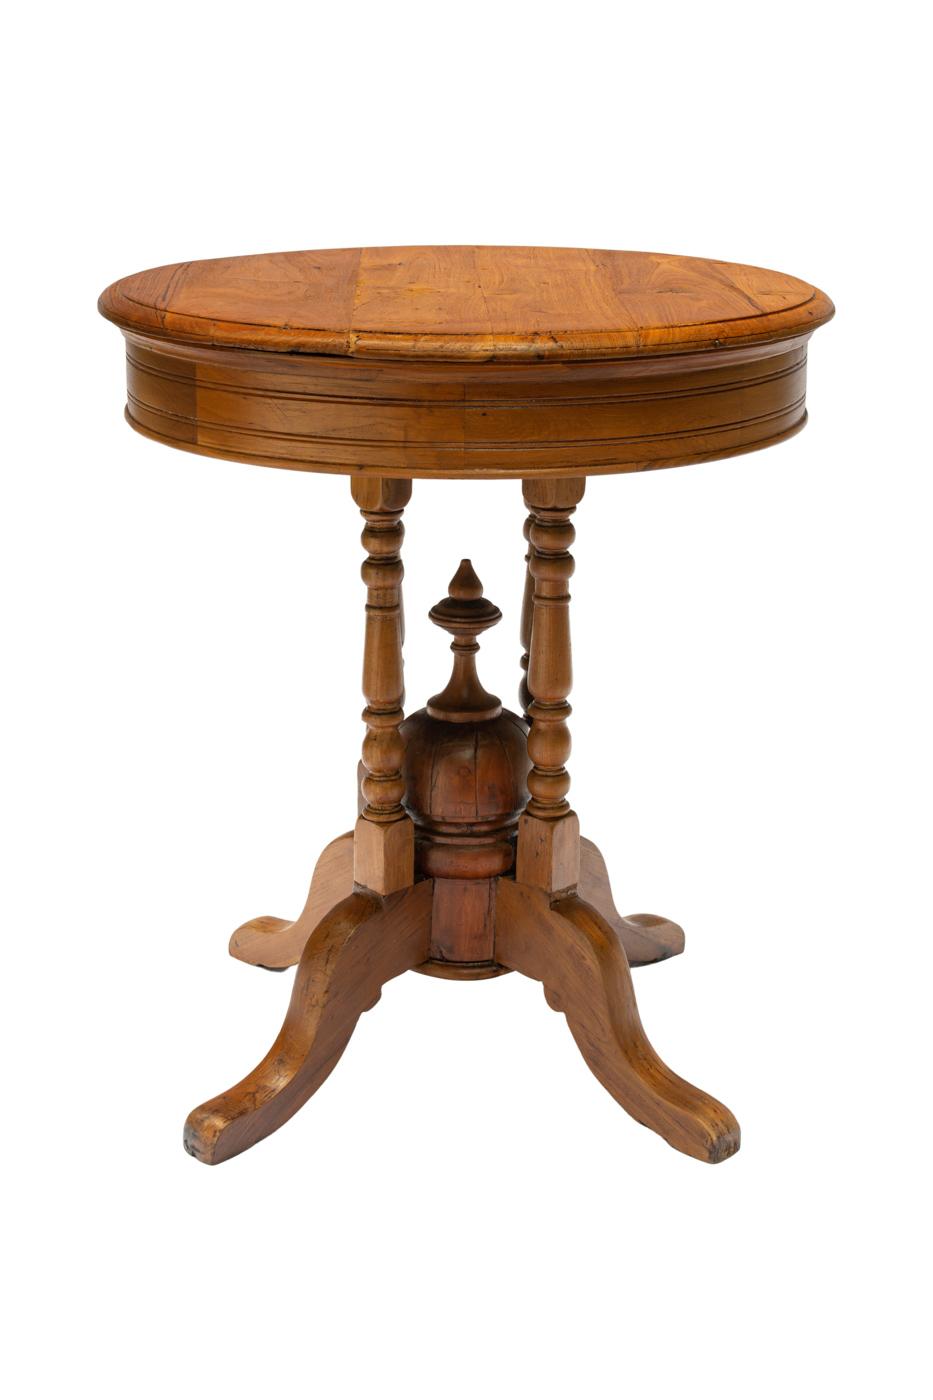 Axuliar table in wood